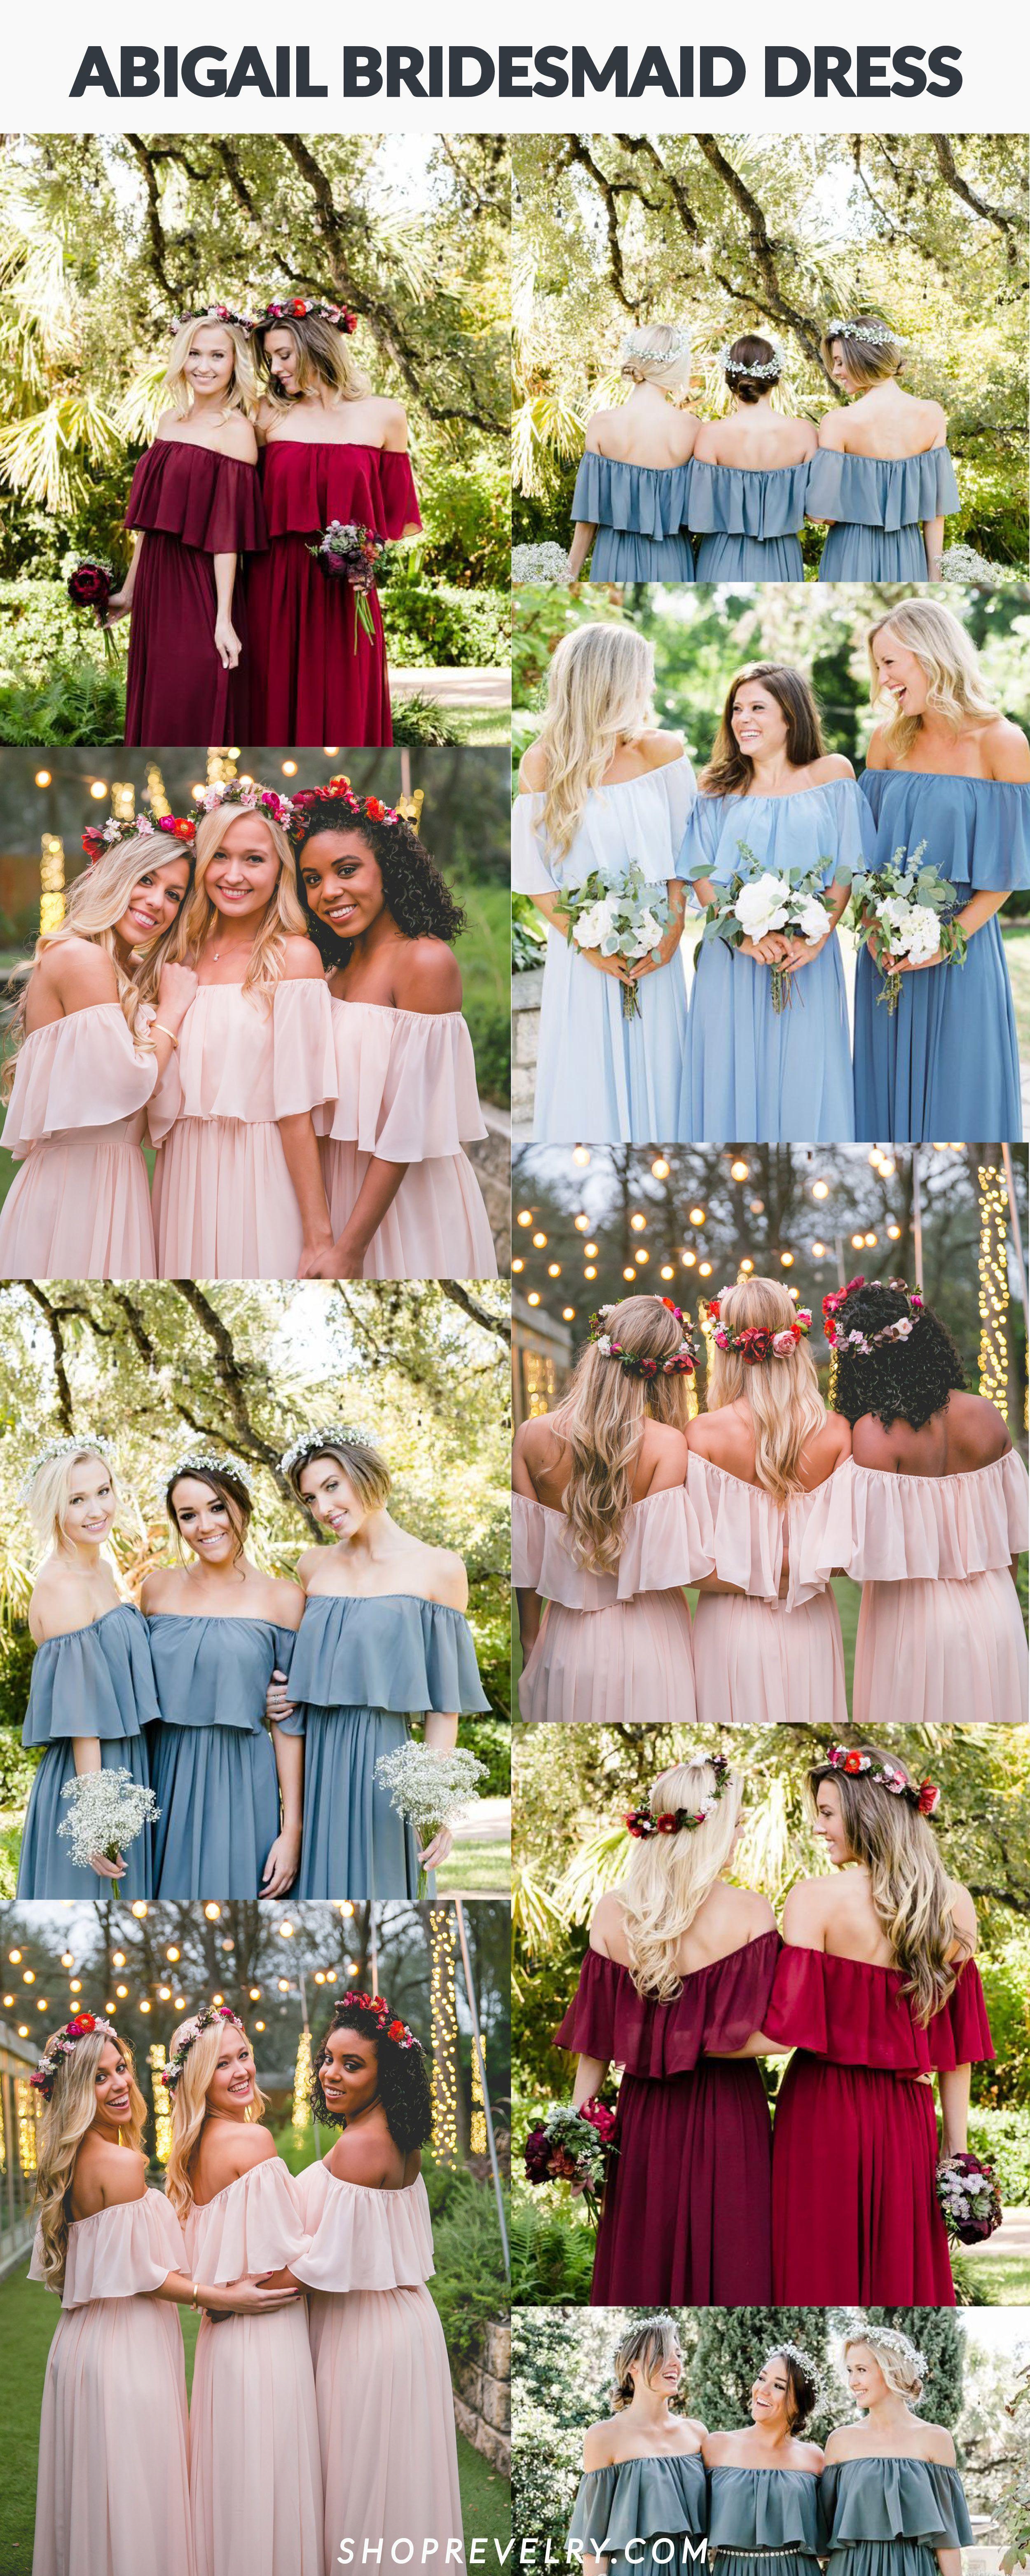 Pin by makenna seymour on wedding bells pinterest dusty blue